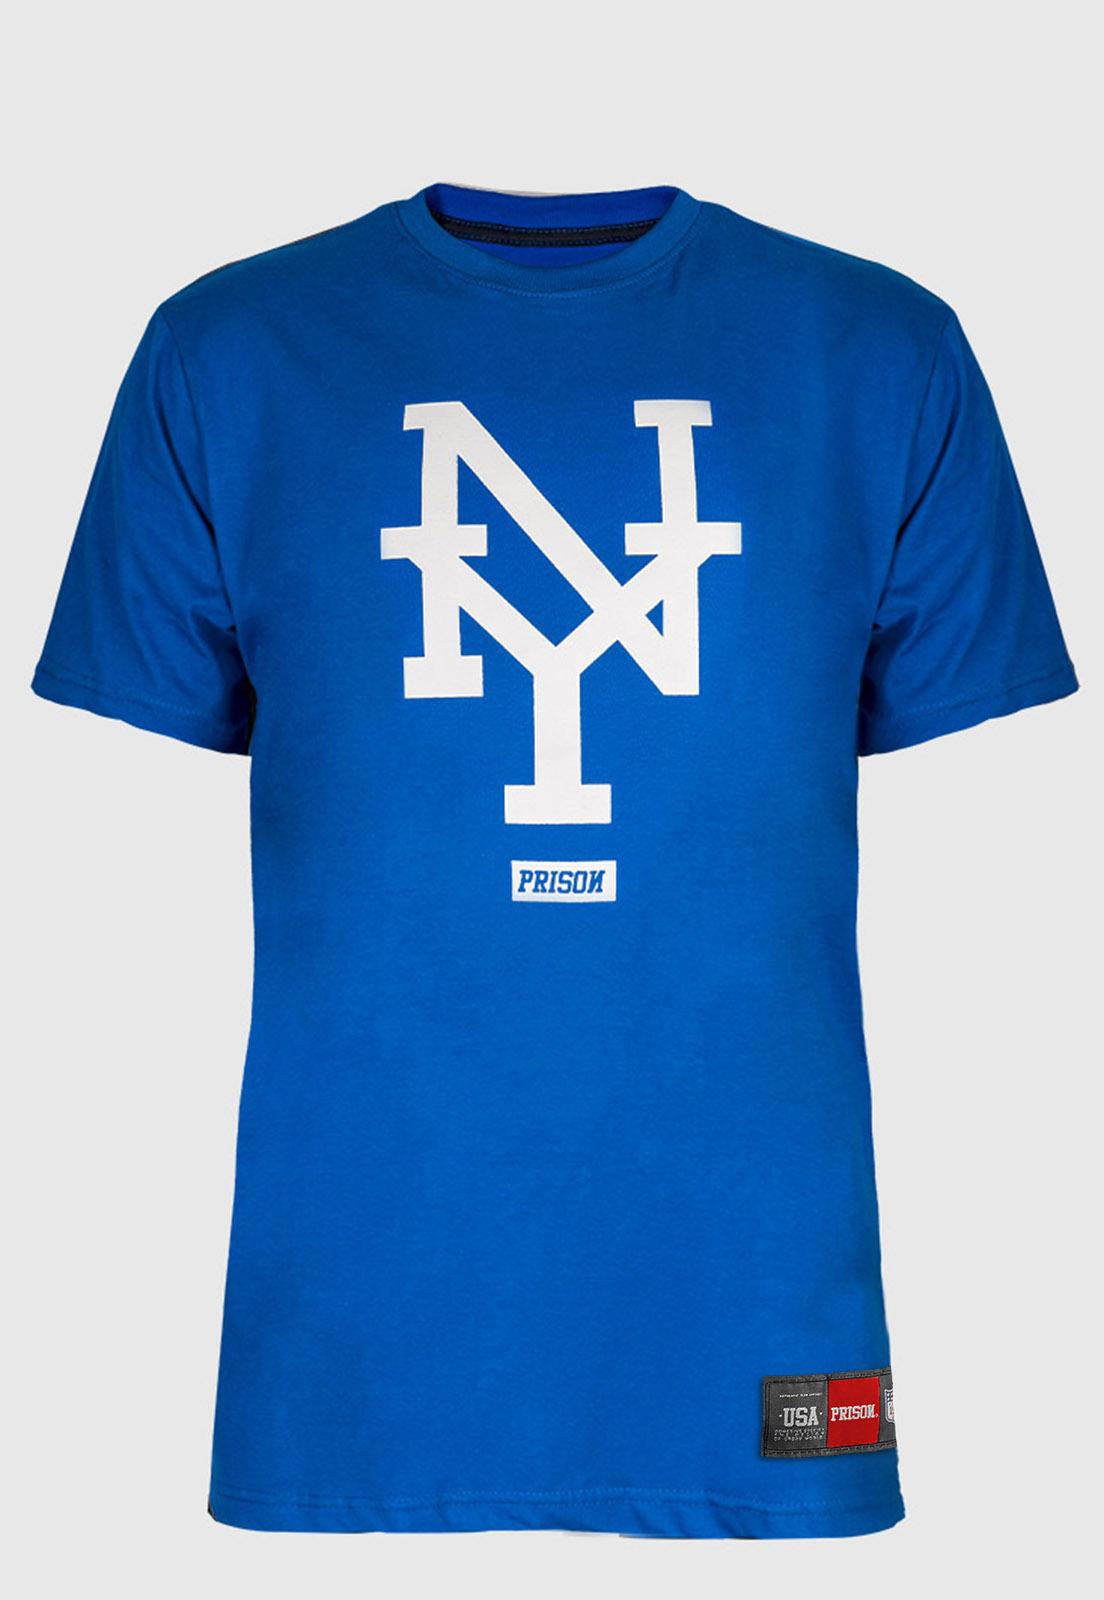 Camiseta New York Prison Azul